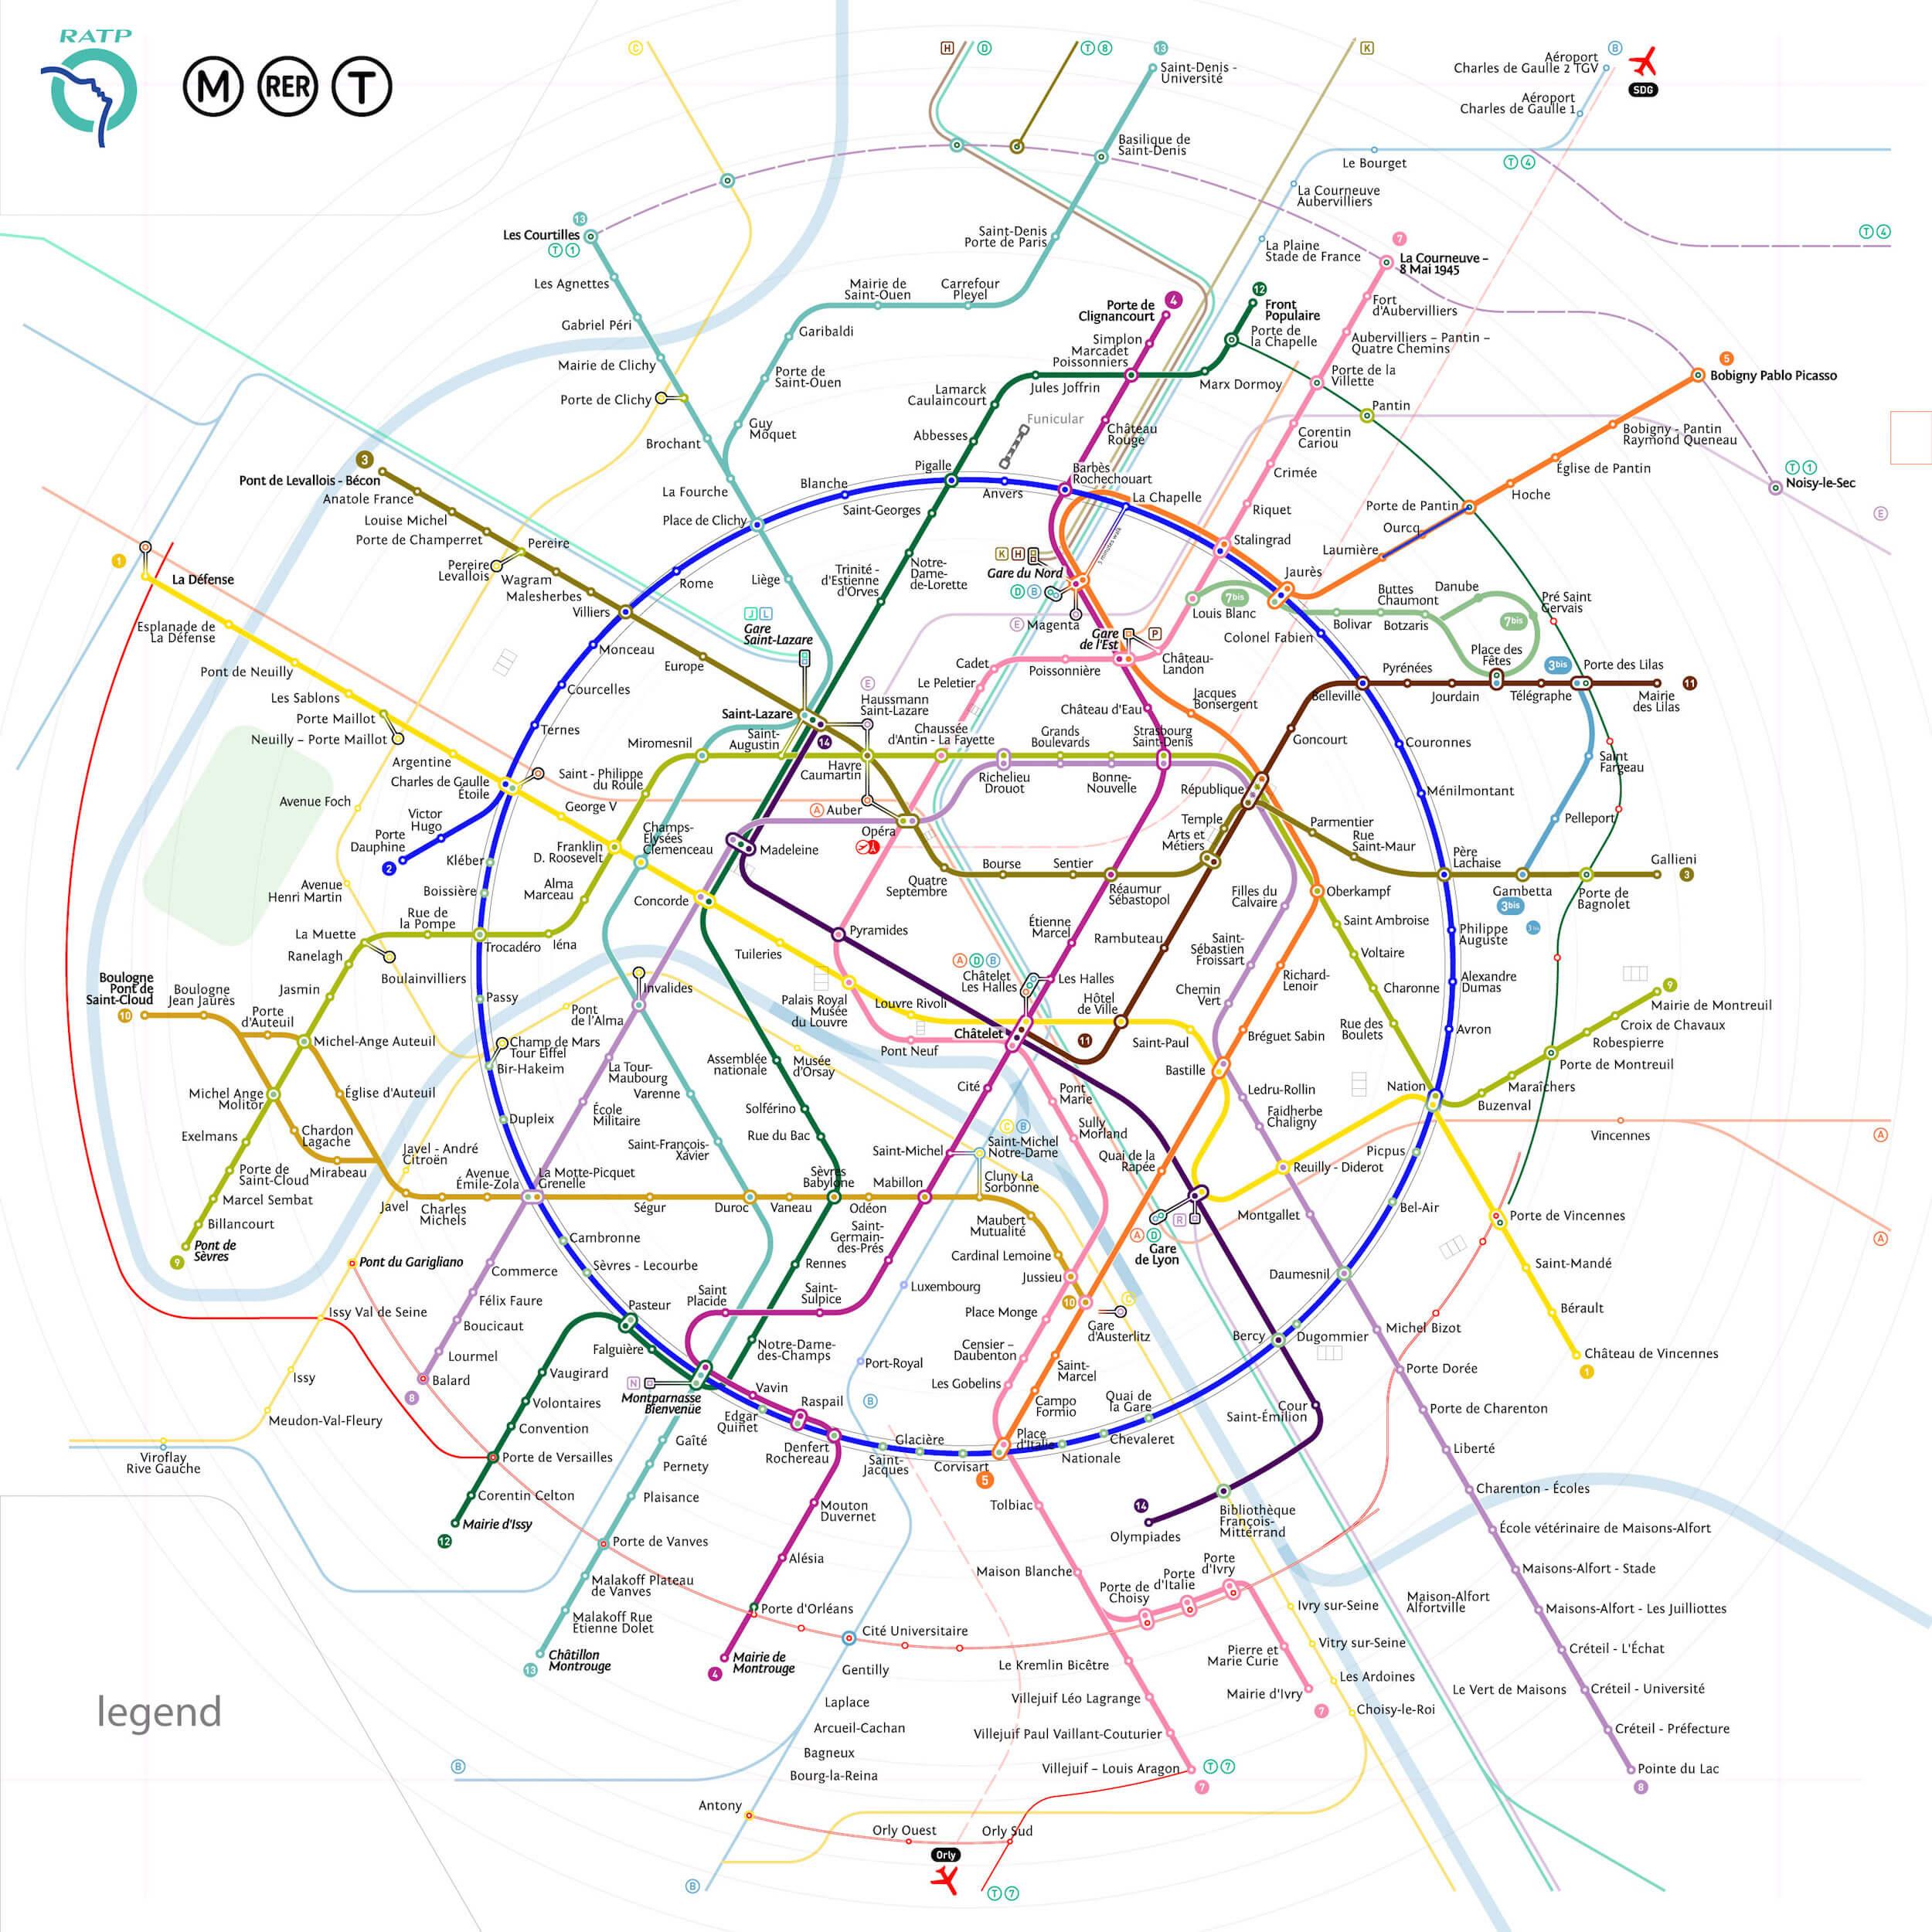 Paris Metro Map Printable.Paris Metro Map The Redesign Smashing Magazine